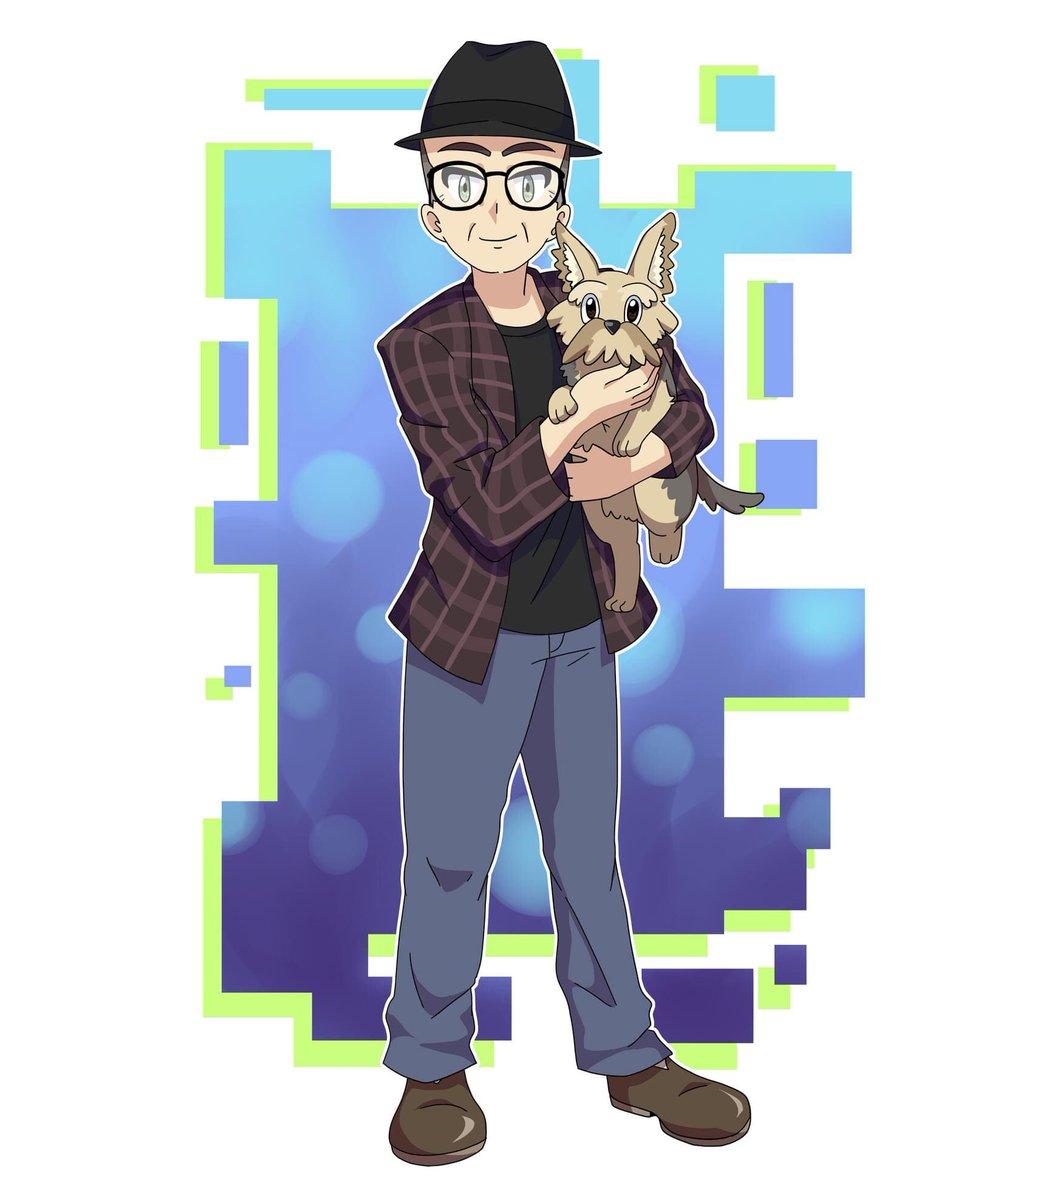 Happy Pokémon Day from Darla the Wonder Dog and me! #PokemonDay